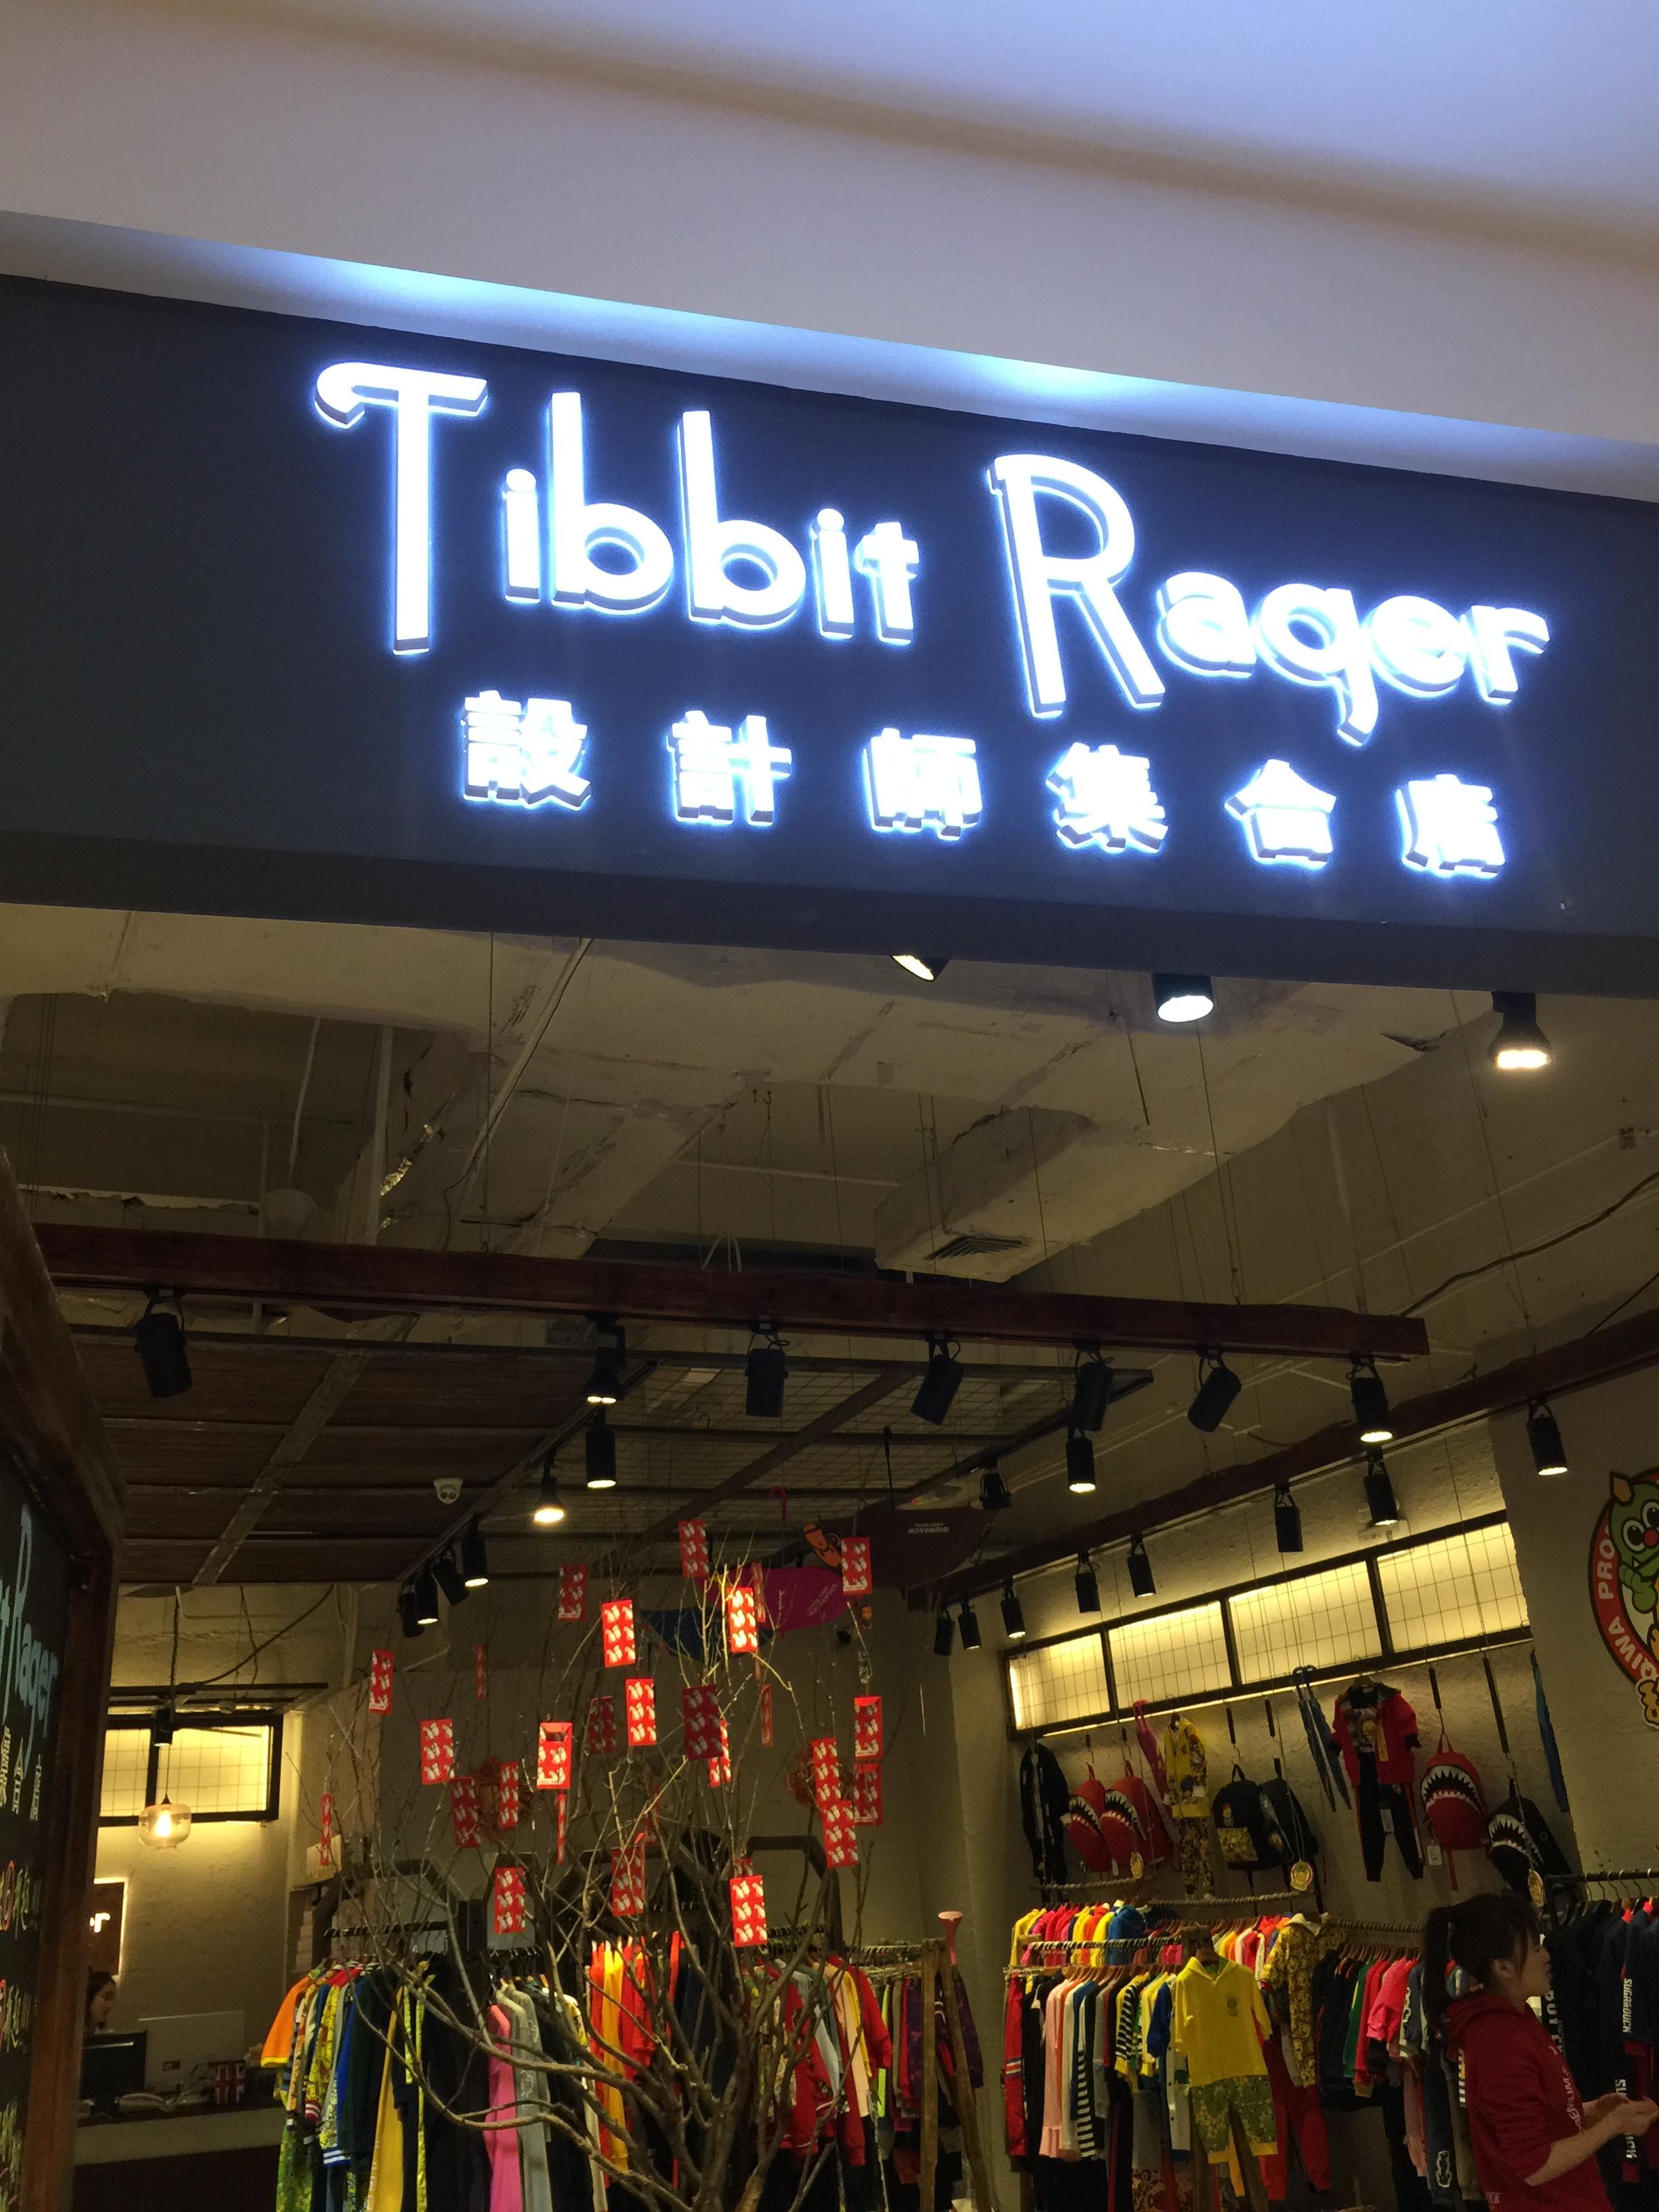 Tibbit Rager设计师集合店